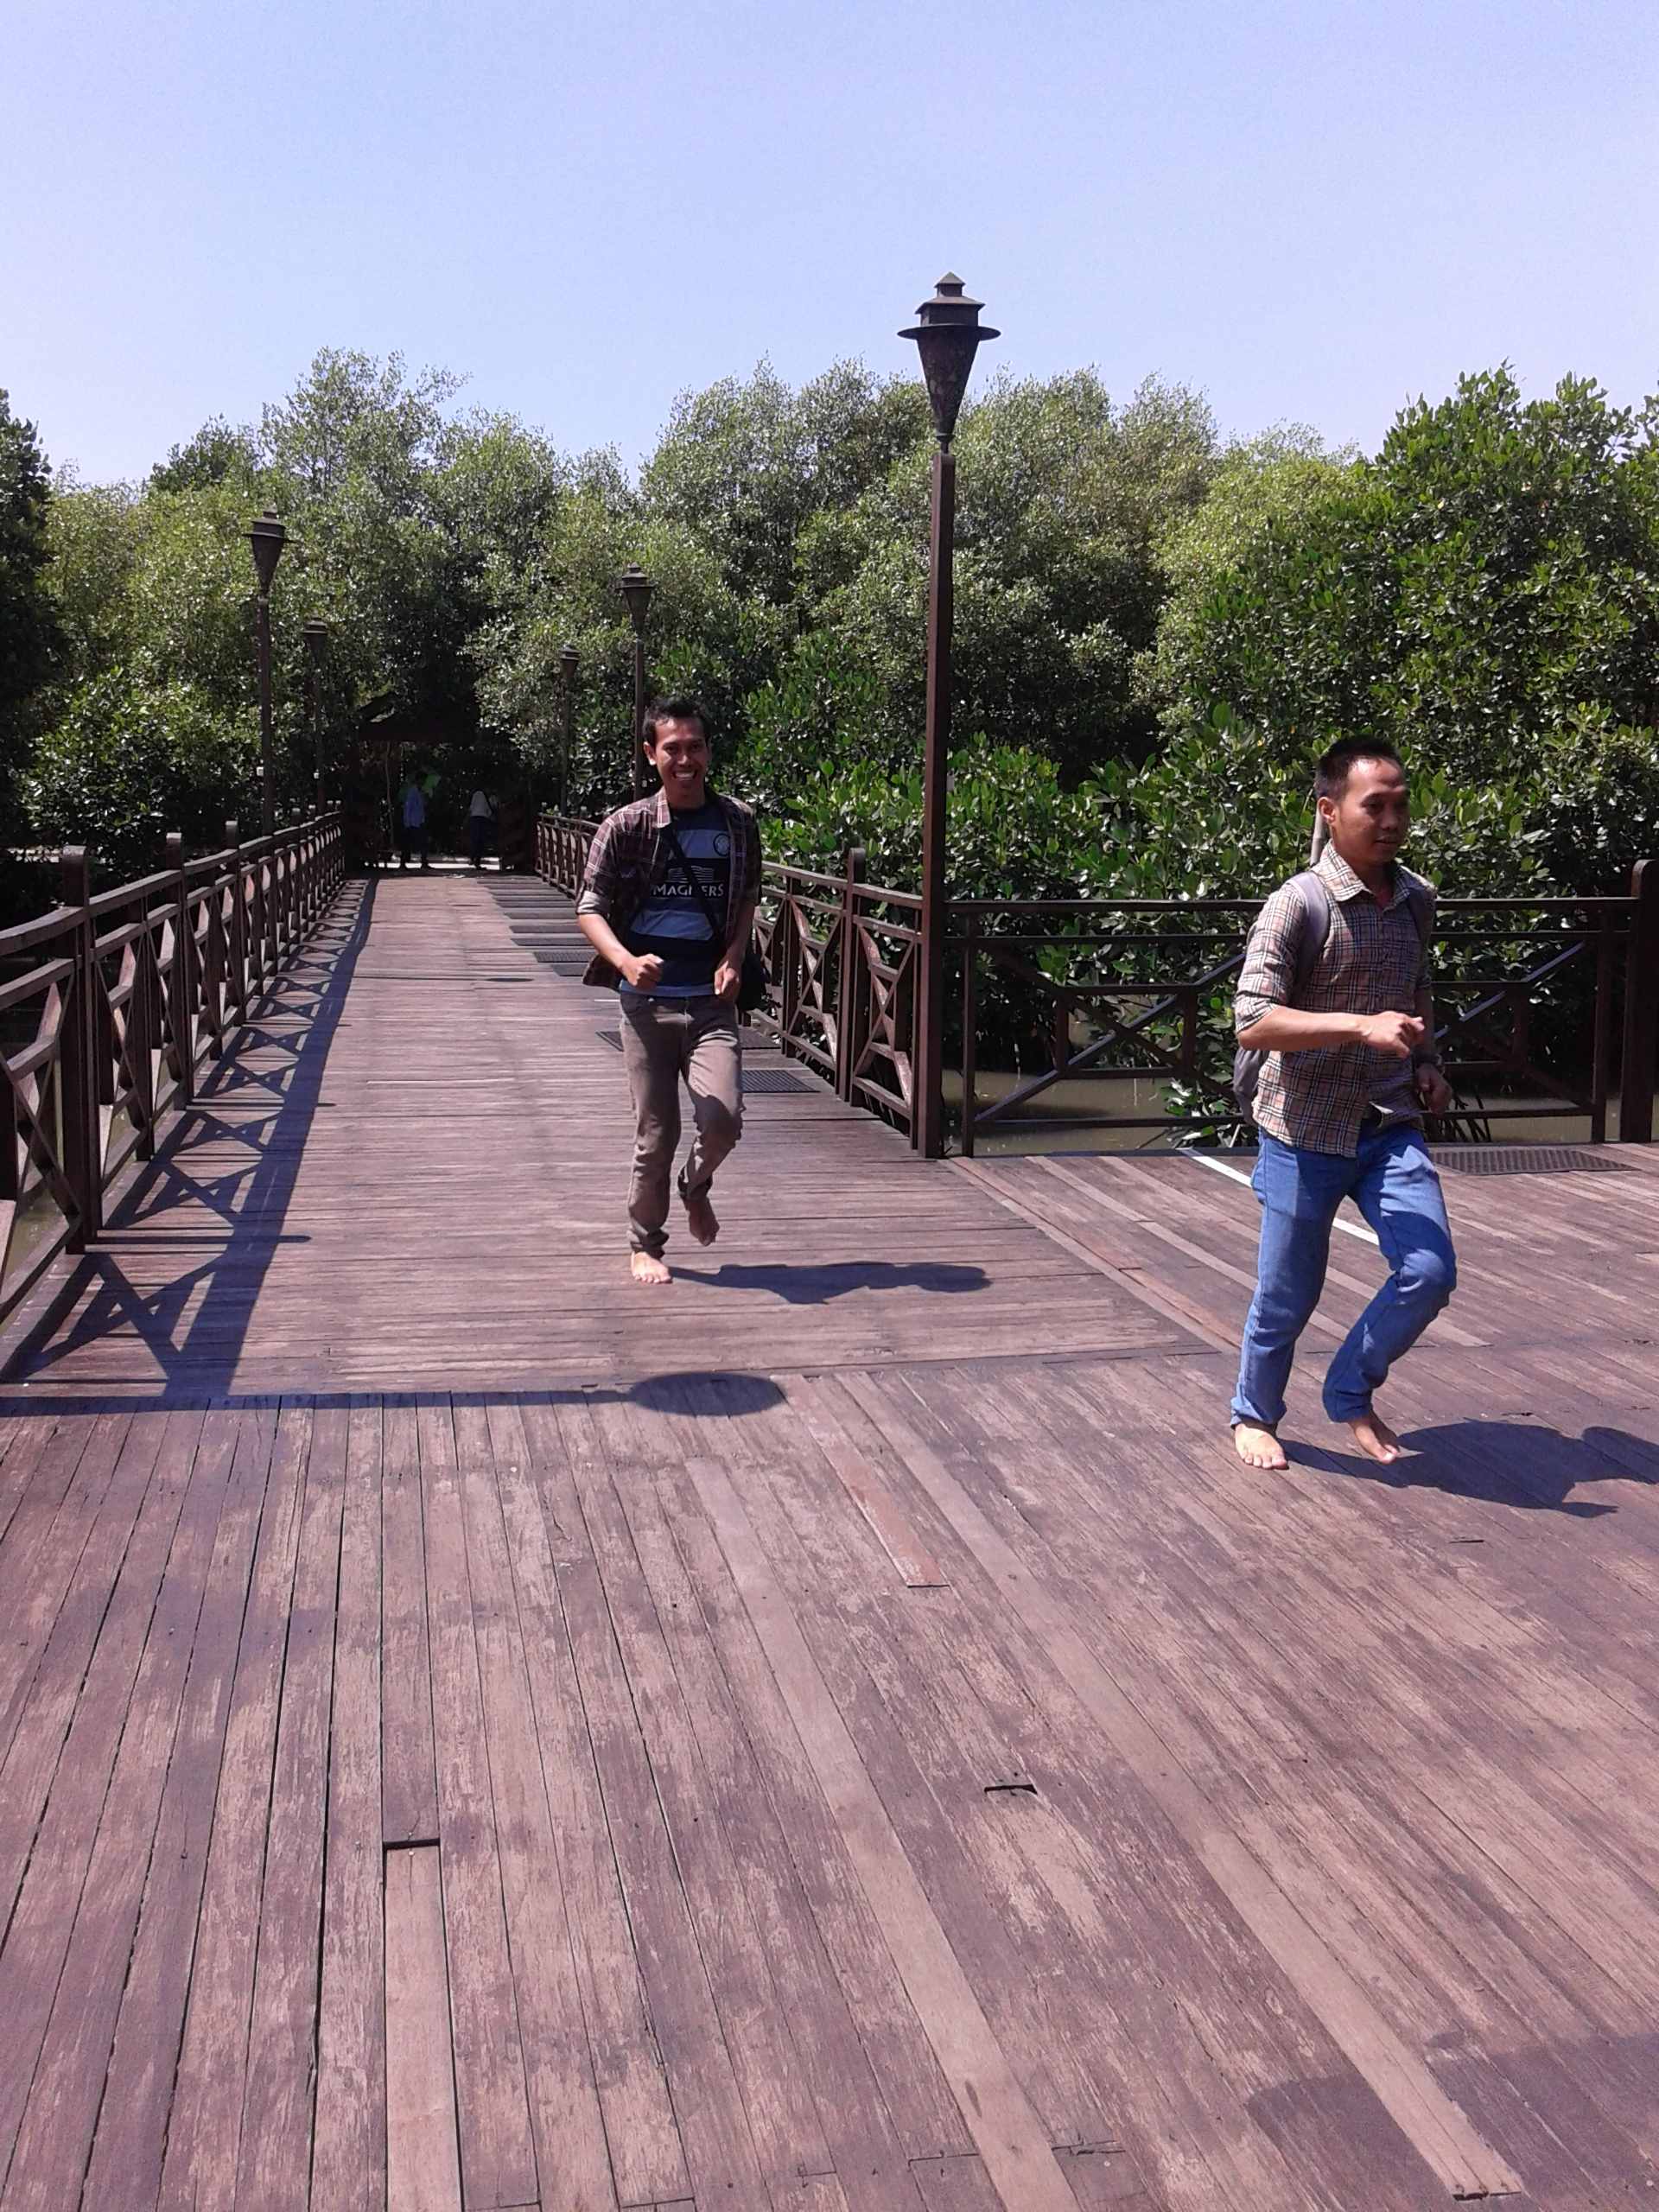 Hutan Mangrove Jakarta – Taman Wisata Alam Angke | A SHORT JOURNEY